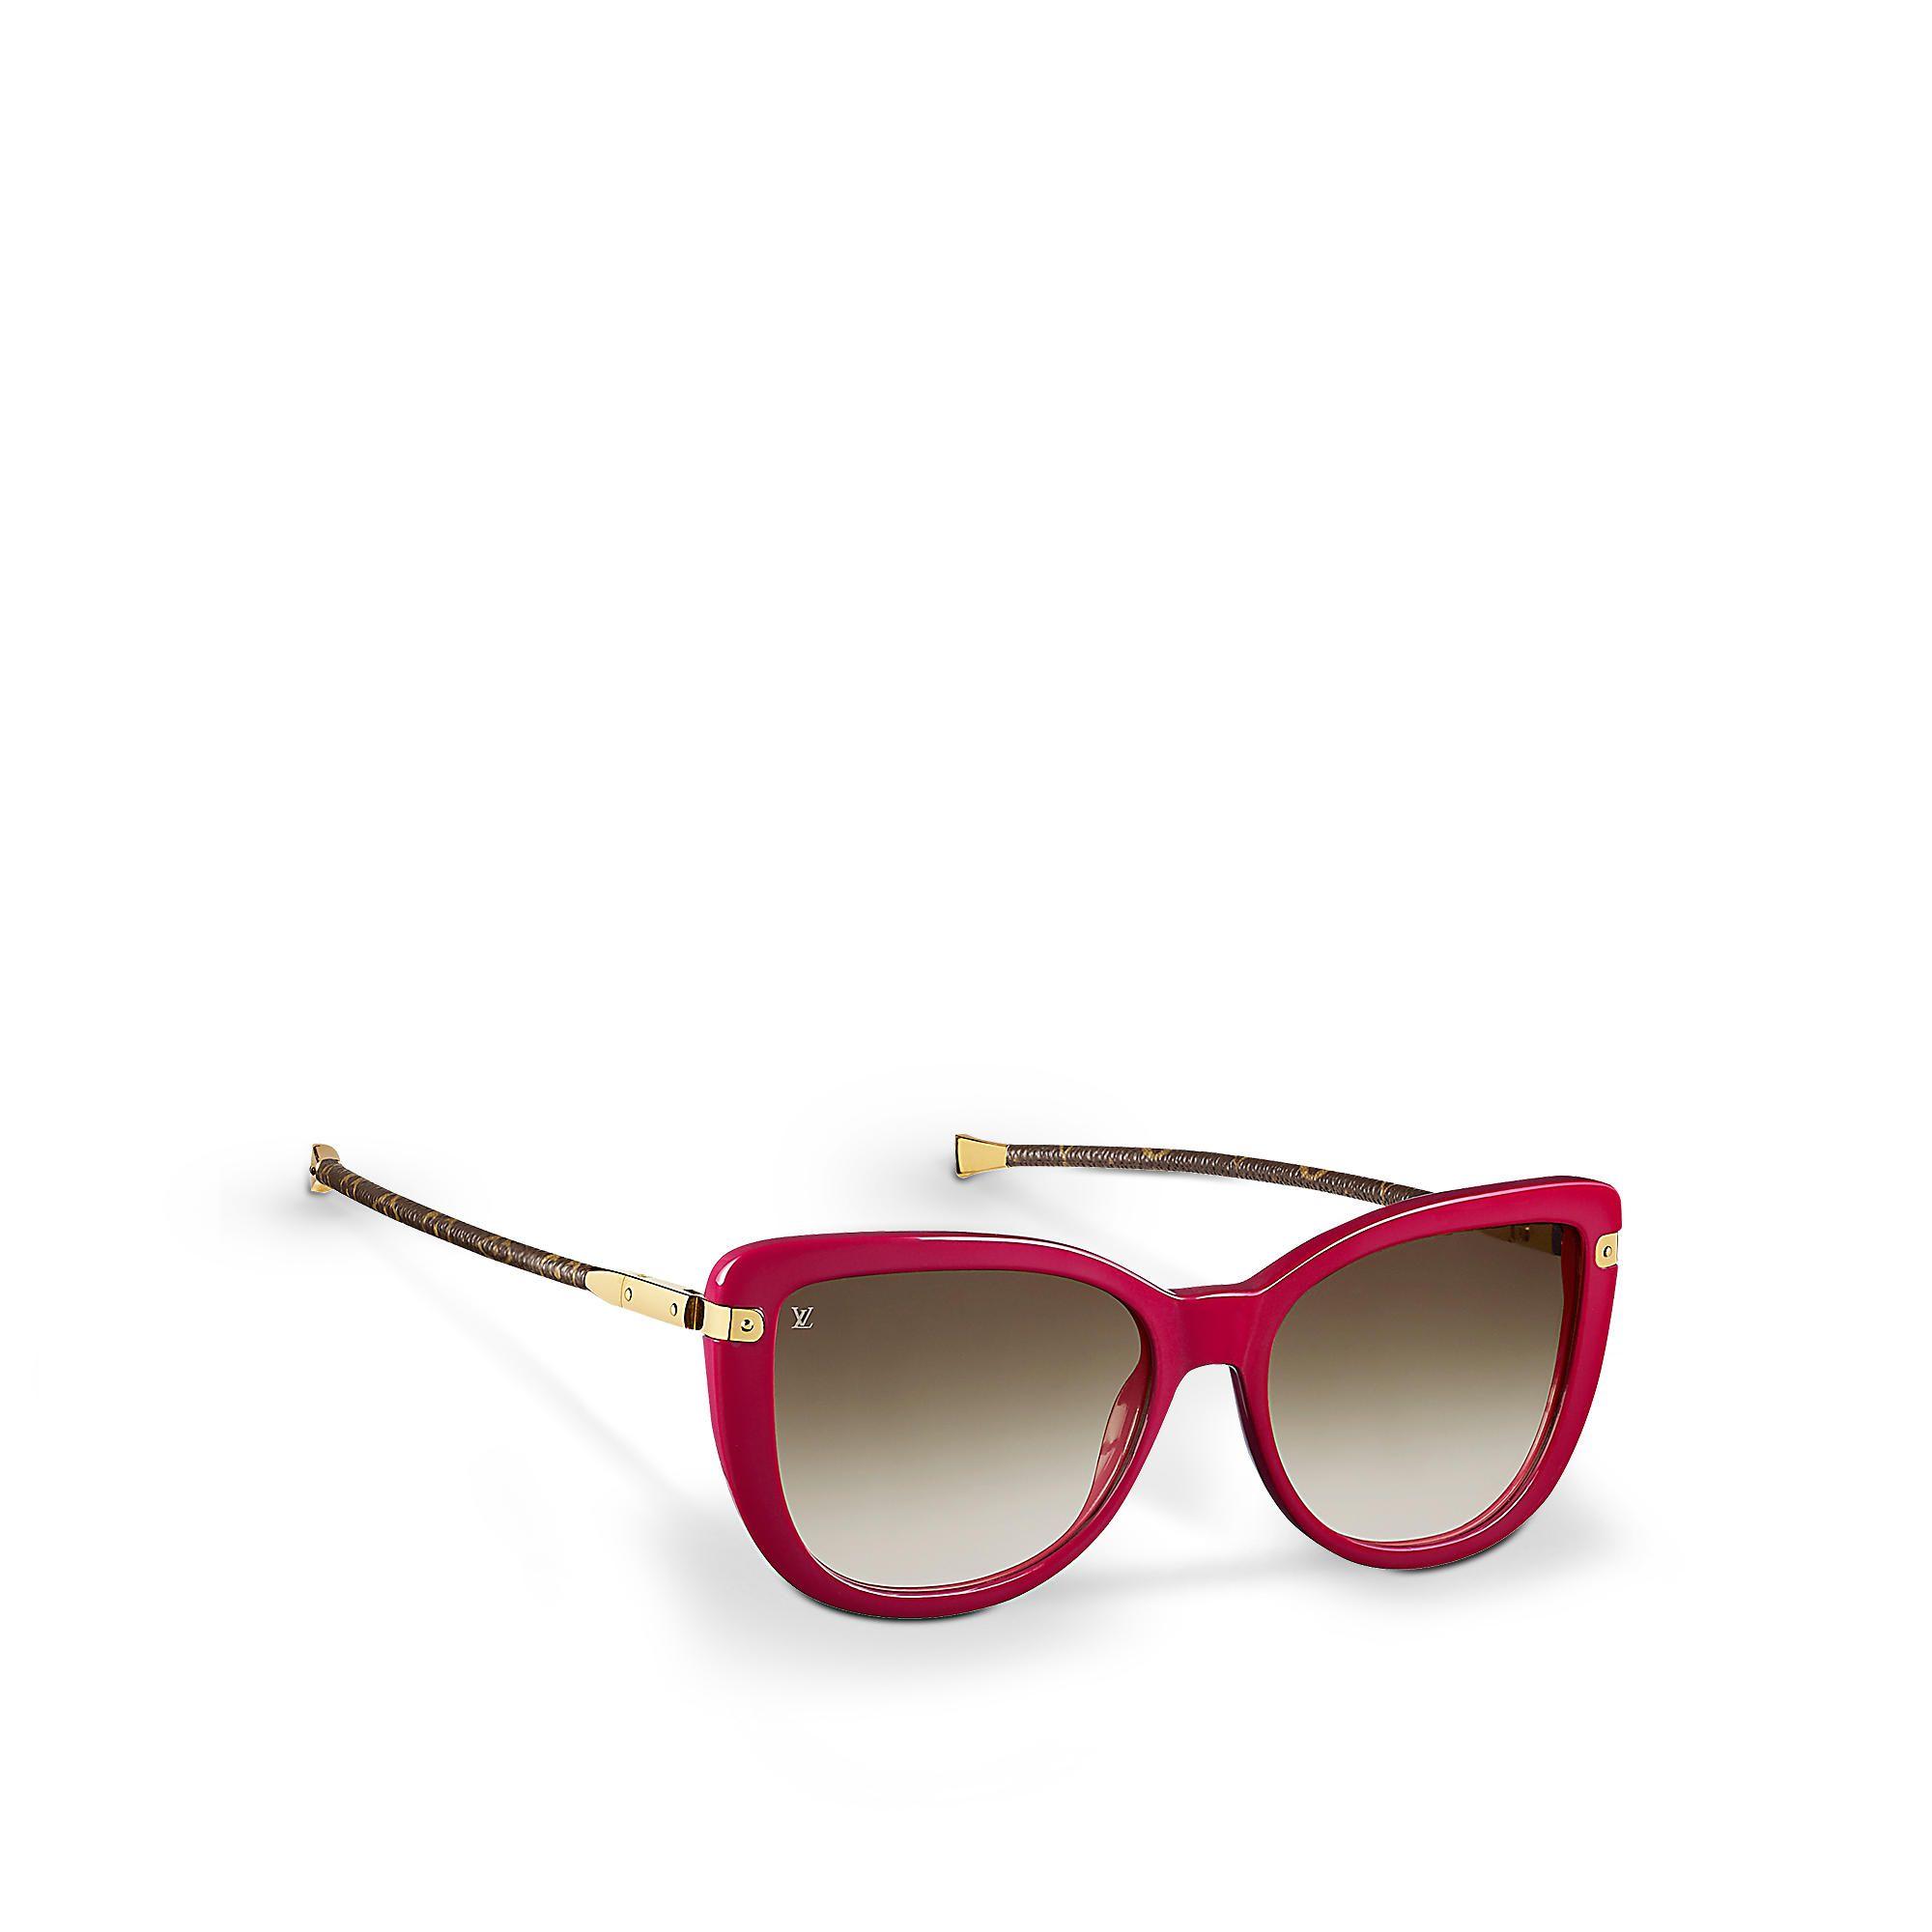 a753b1ad9c Five Reasons To Wear Louis Vuitton Sunglasses This Summer - Pursuitist.  Discover Louis Vuitton Charlotte via Louis Vuitton